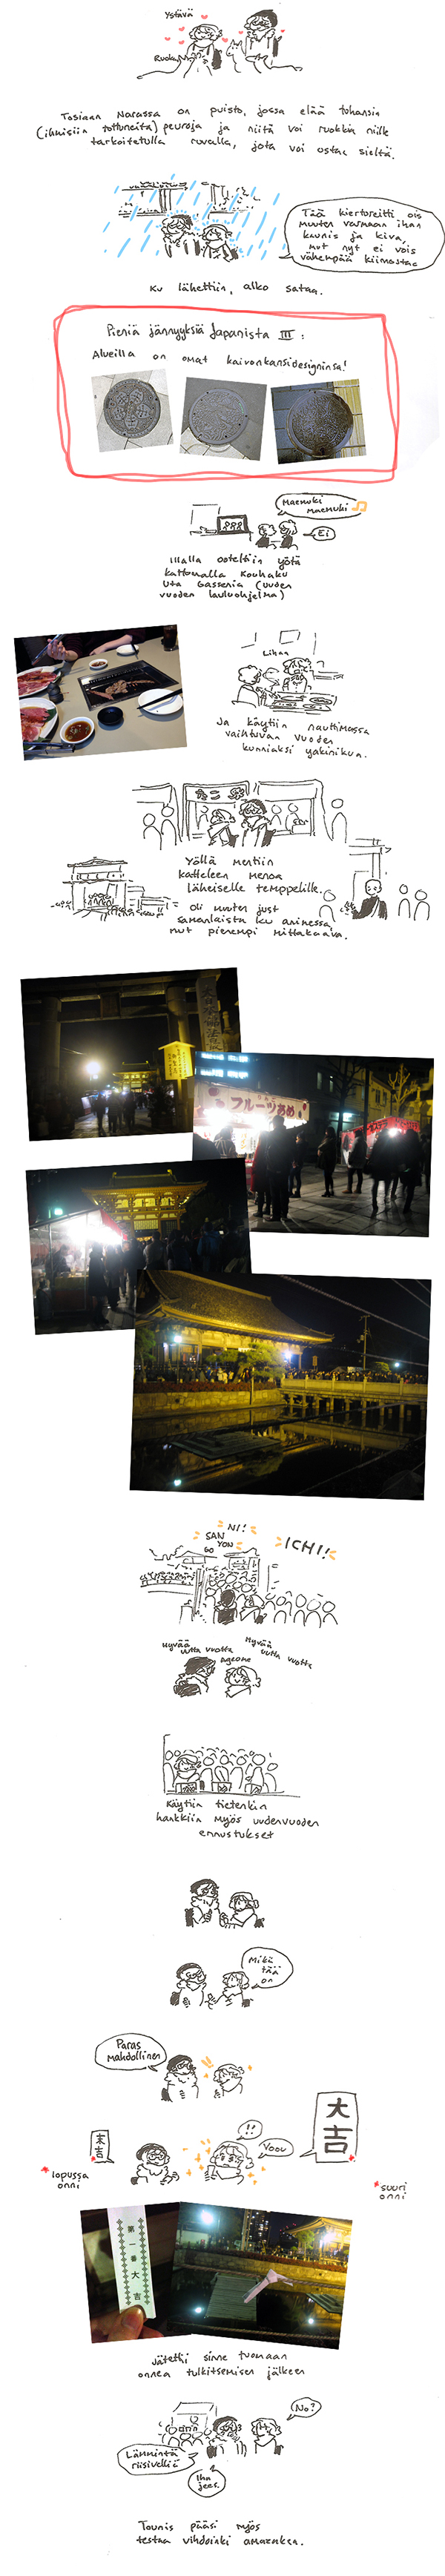 Sarjakuva442 Japanissa 14